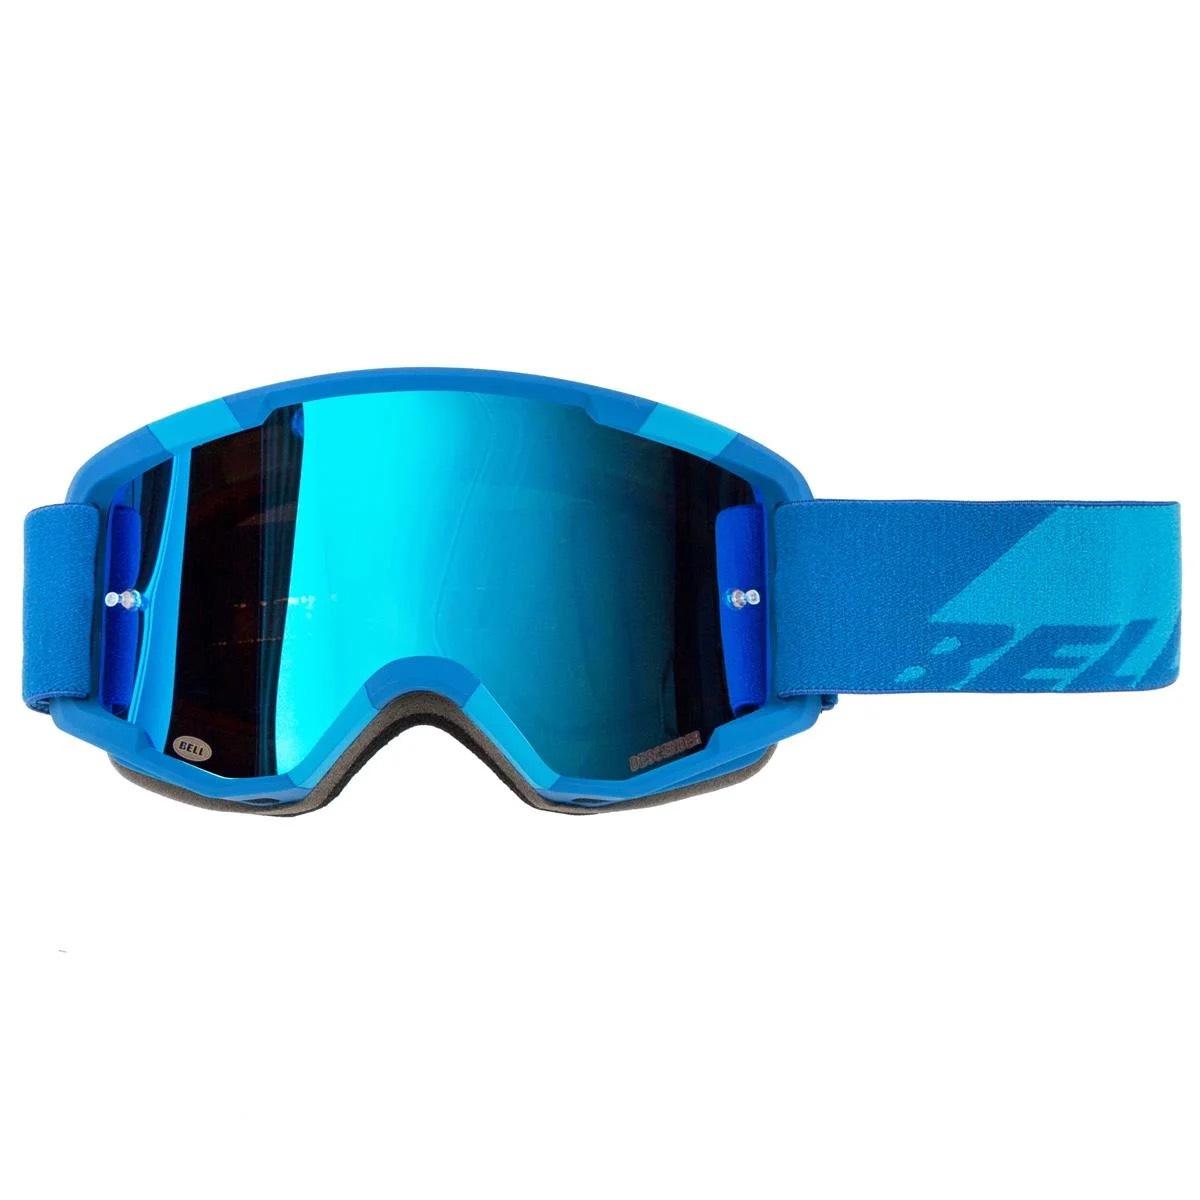 [Maciag Offroad] Bell Descender Goggle Blau